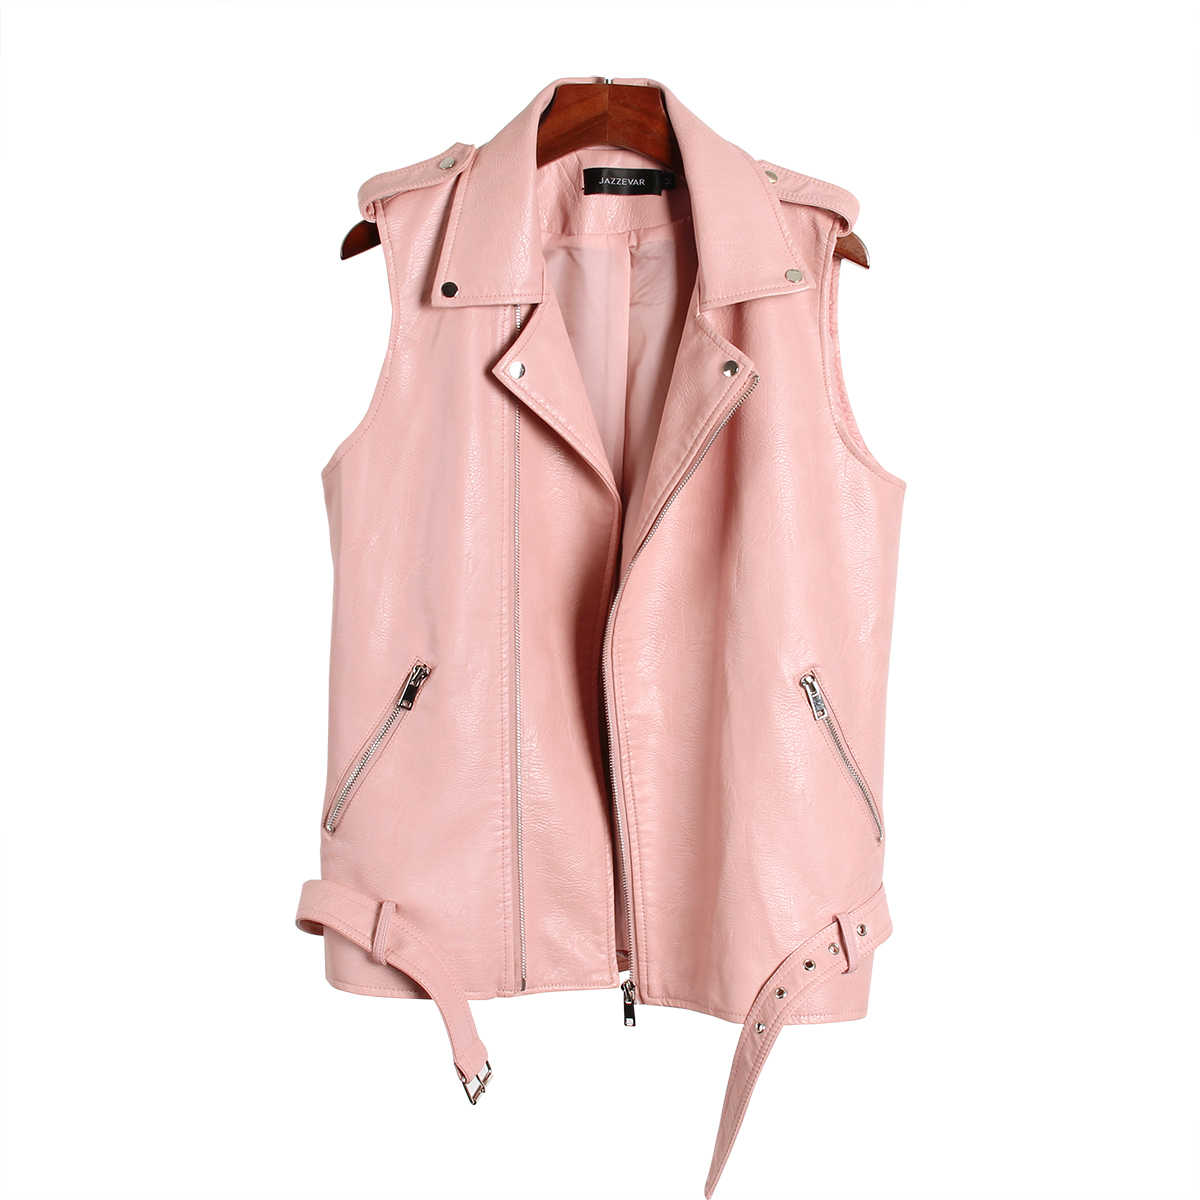 JAZZEVAR 2019 春高ファッションストリート女性の洗浄 Pu レザージャケットジッパー明るい色新レディースベスト 870203